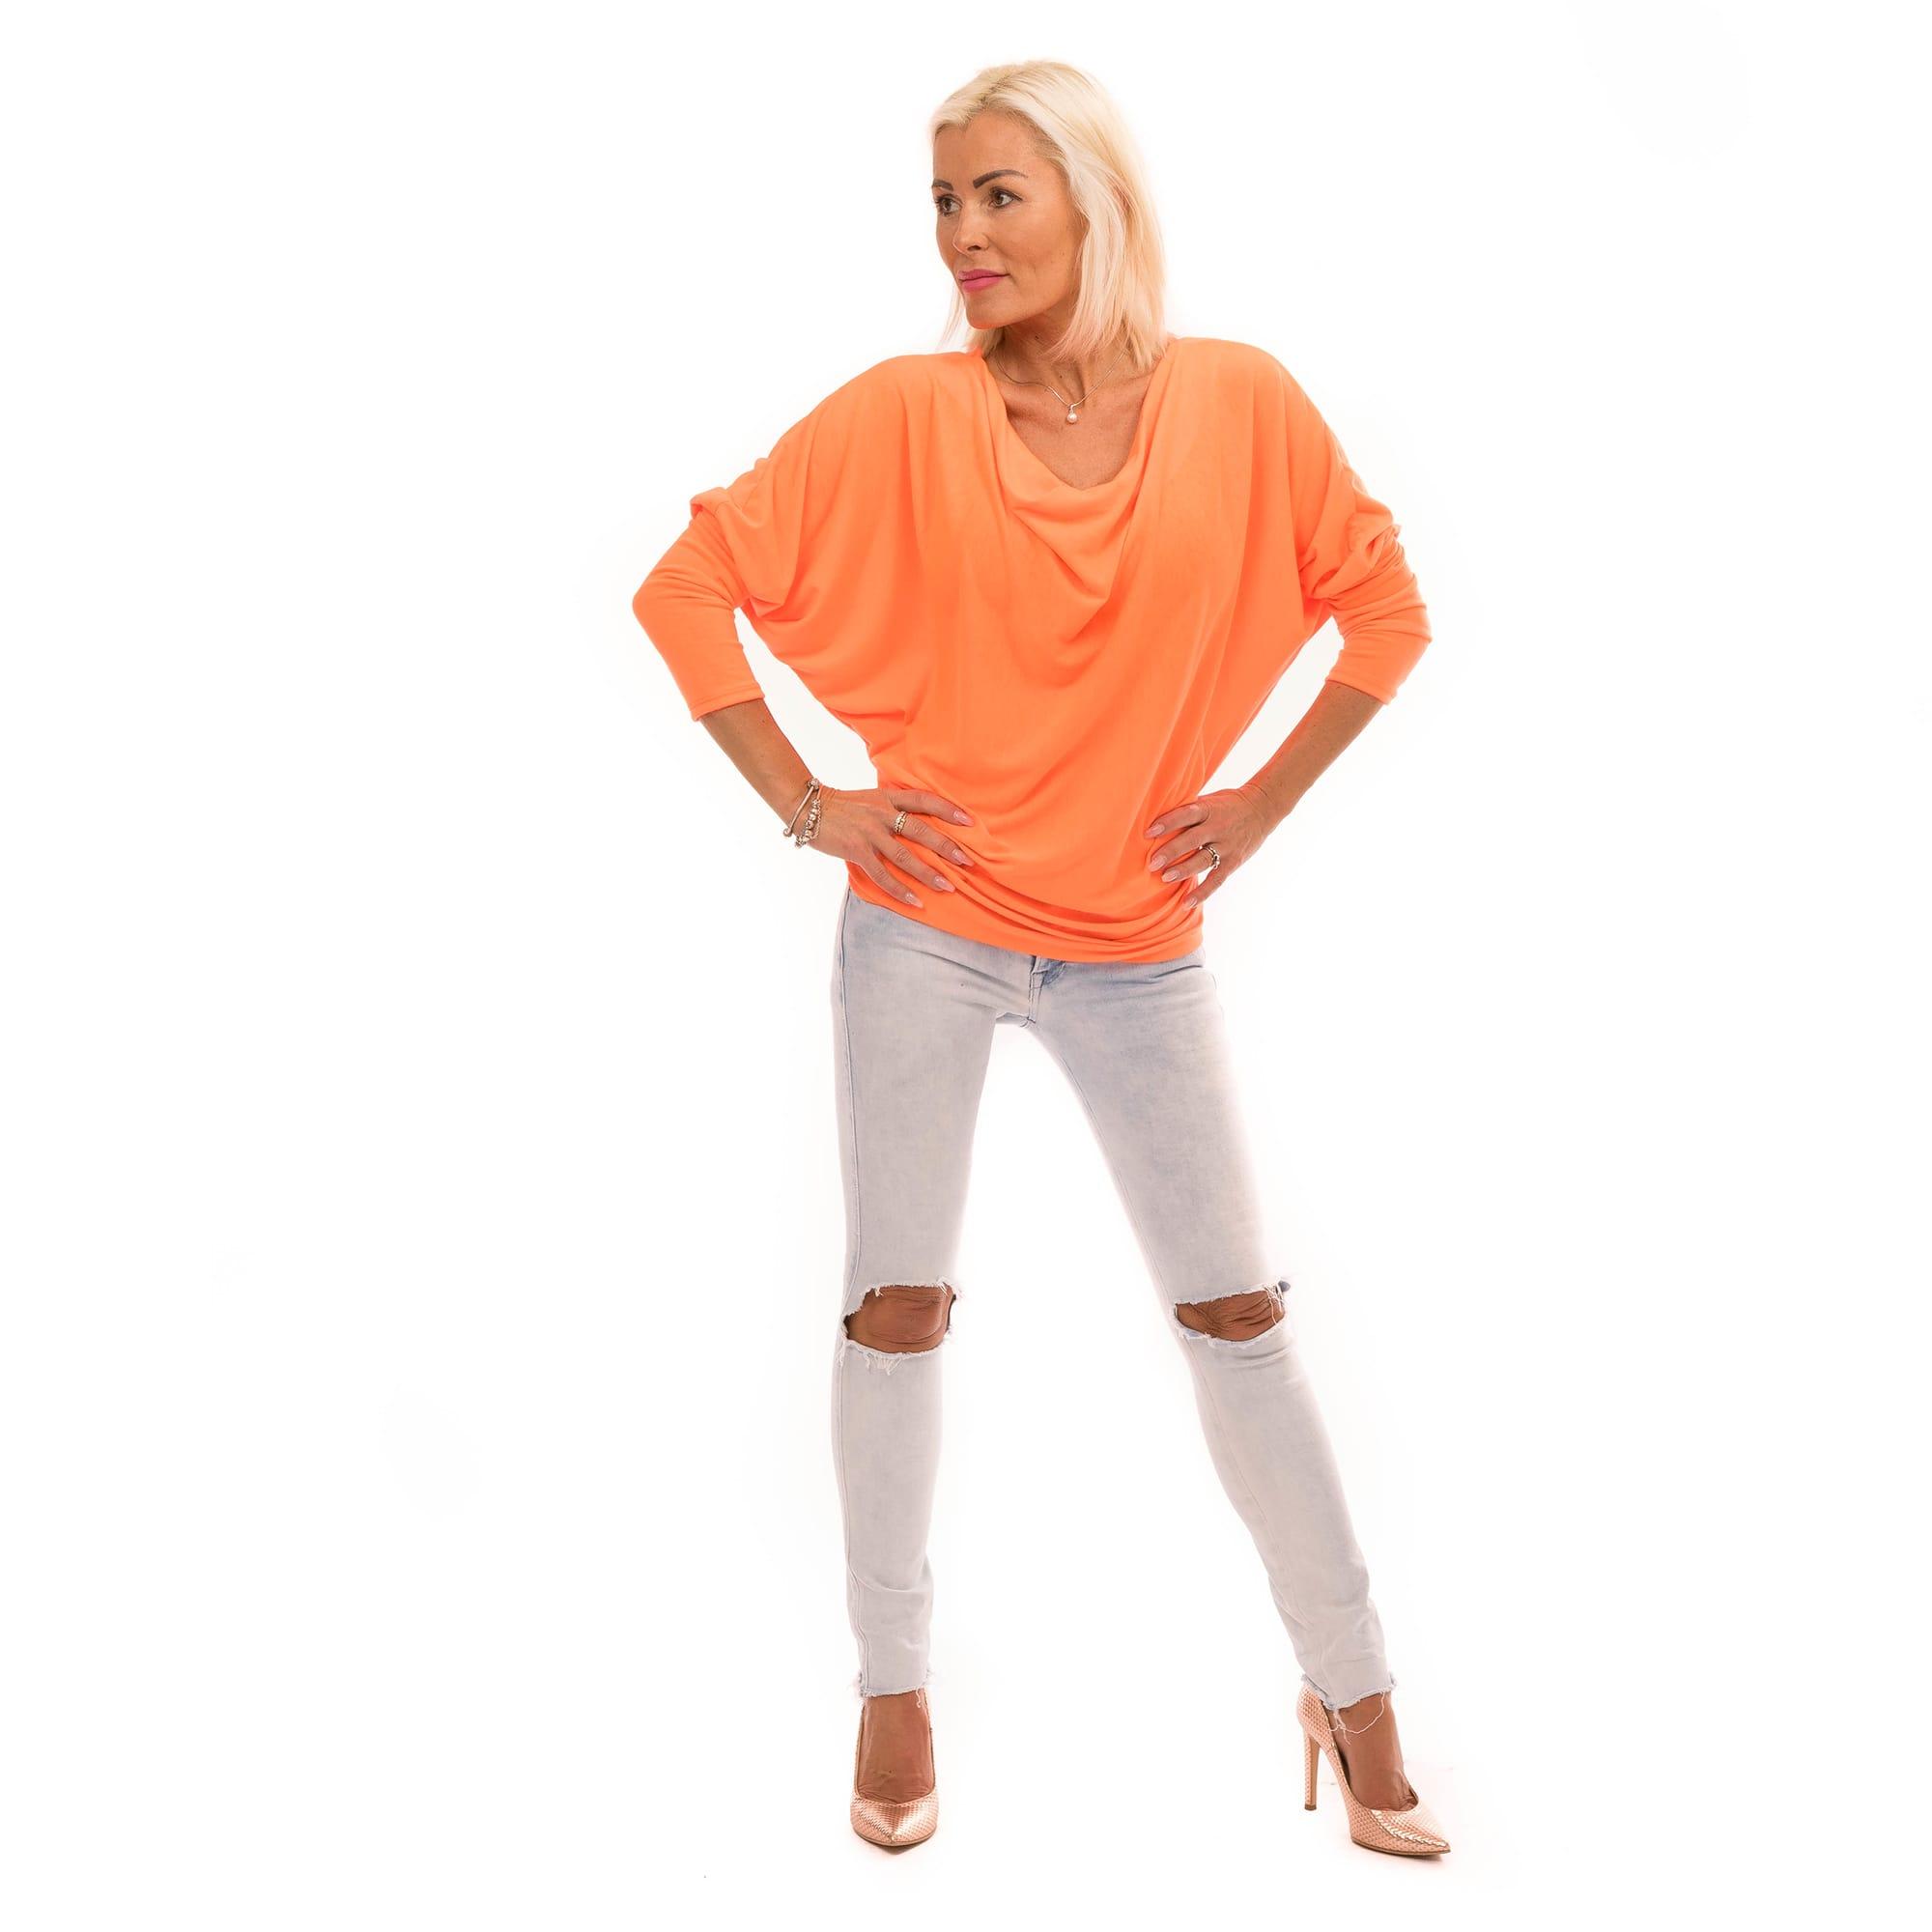 31d02a59dc04 Dámska móda a doplnky - Blúzka s výstrihom voda - Neon Orange ...